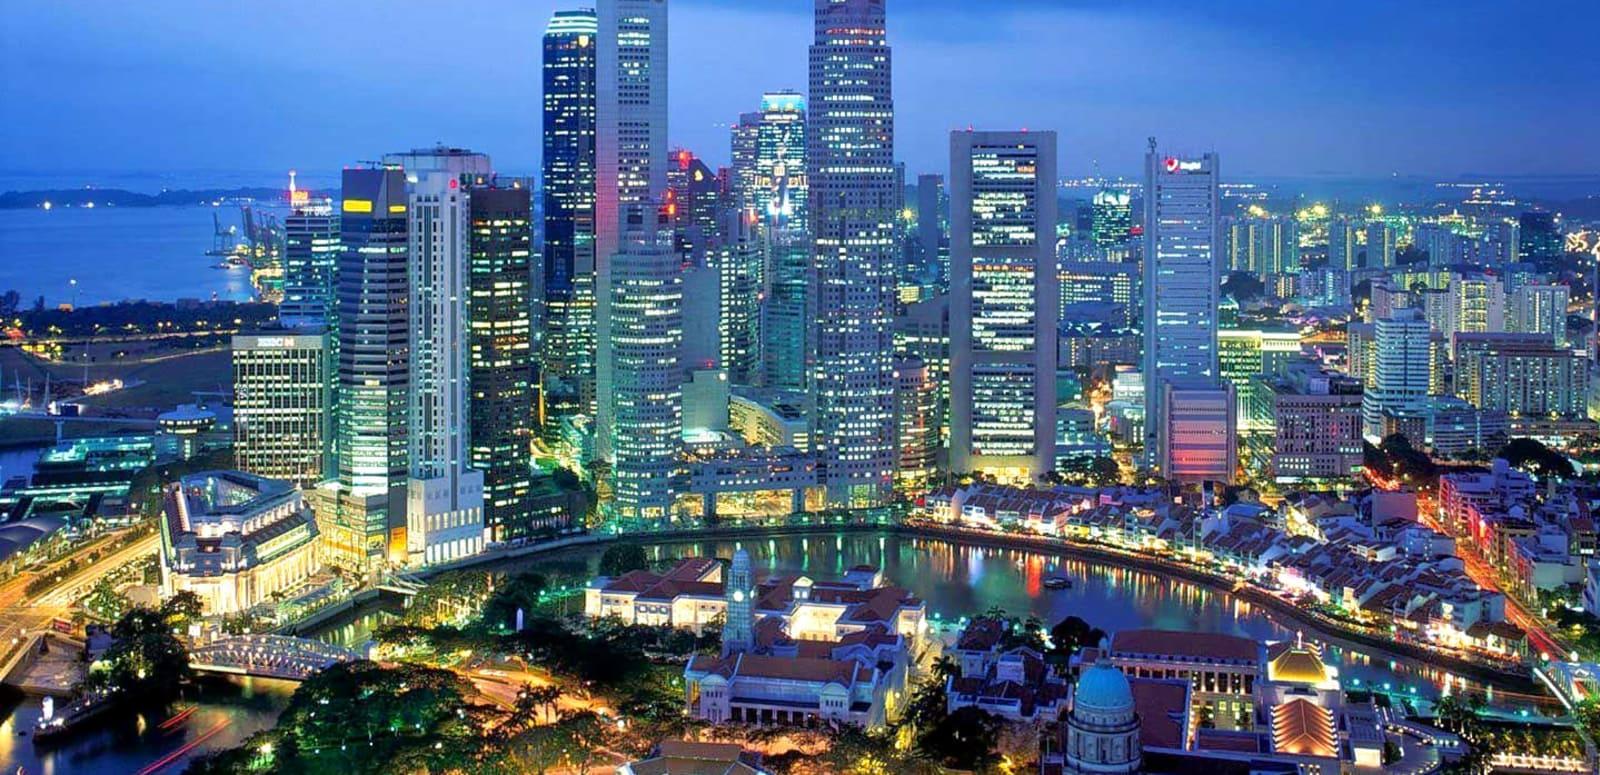 1491920757_aerial_view_of_singapore.jpg